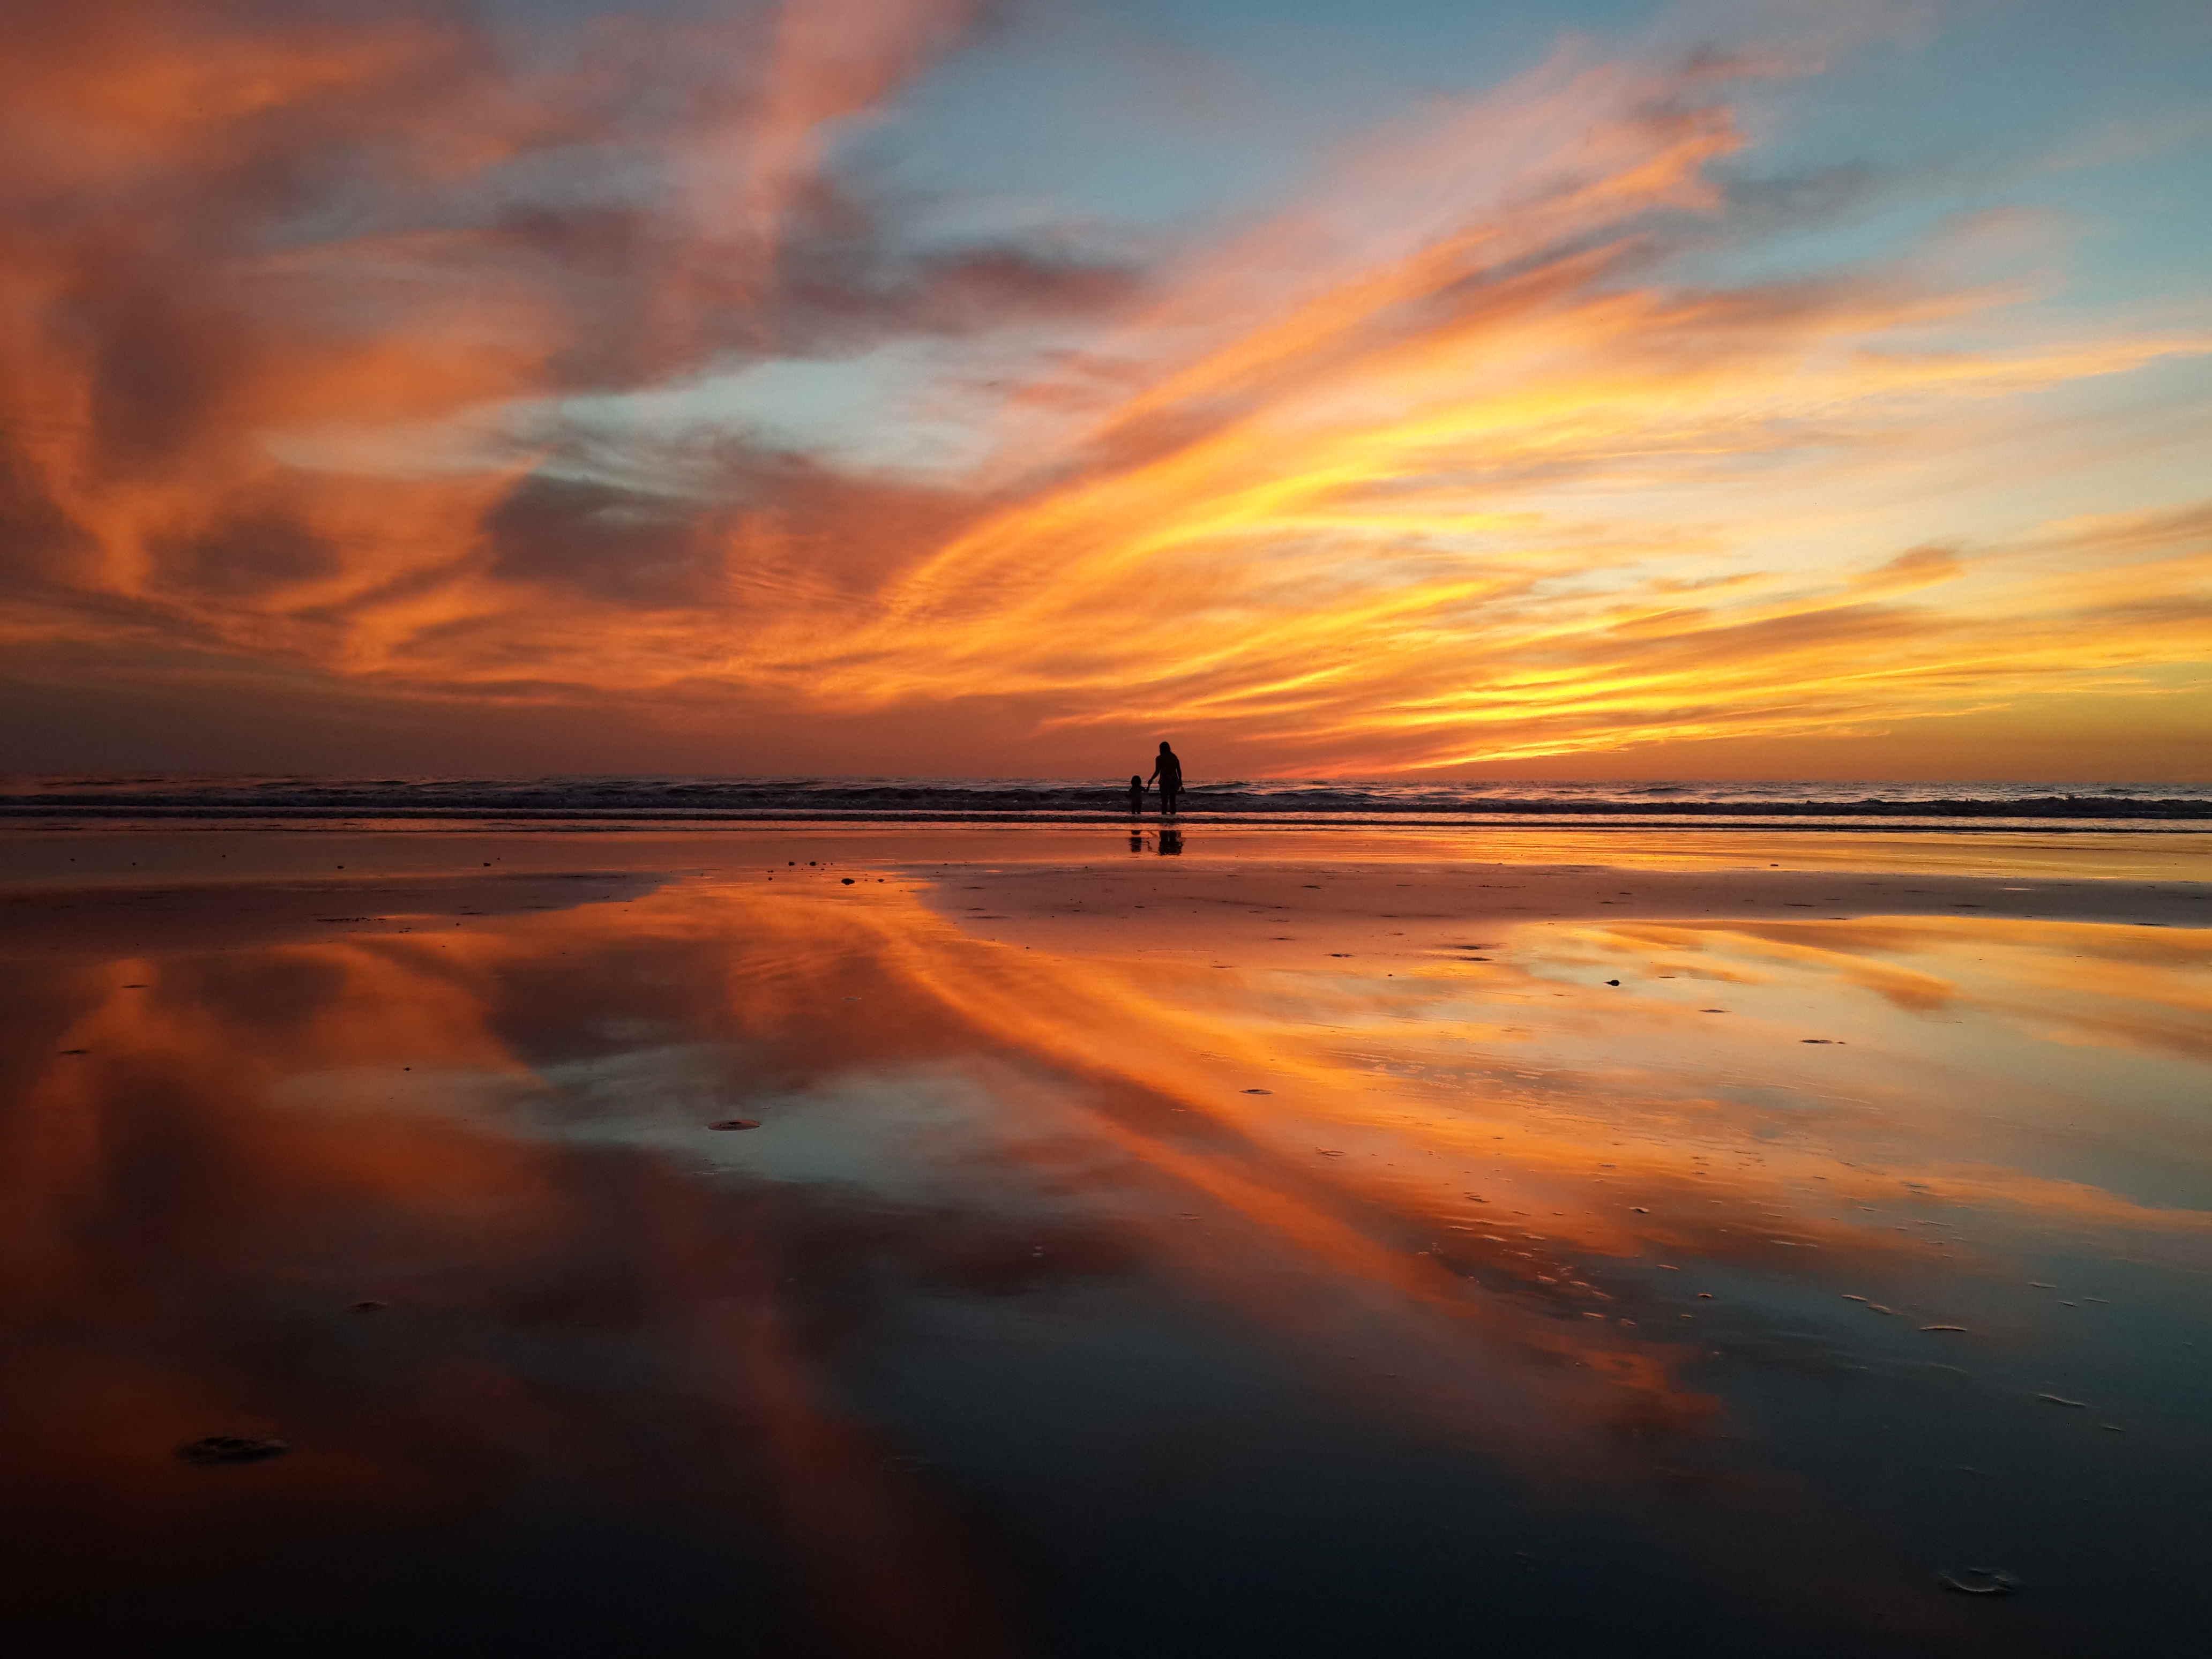 Fotos de stock gratuitas de amanecer, arena, cielo, litoral